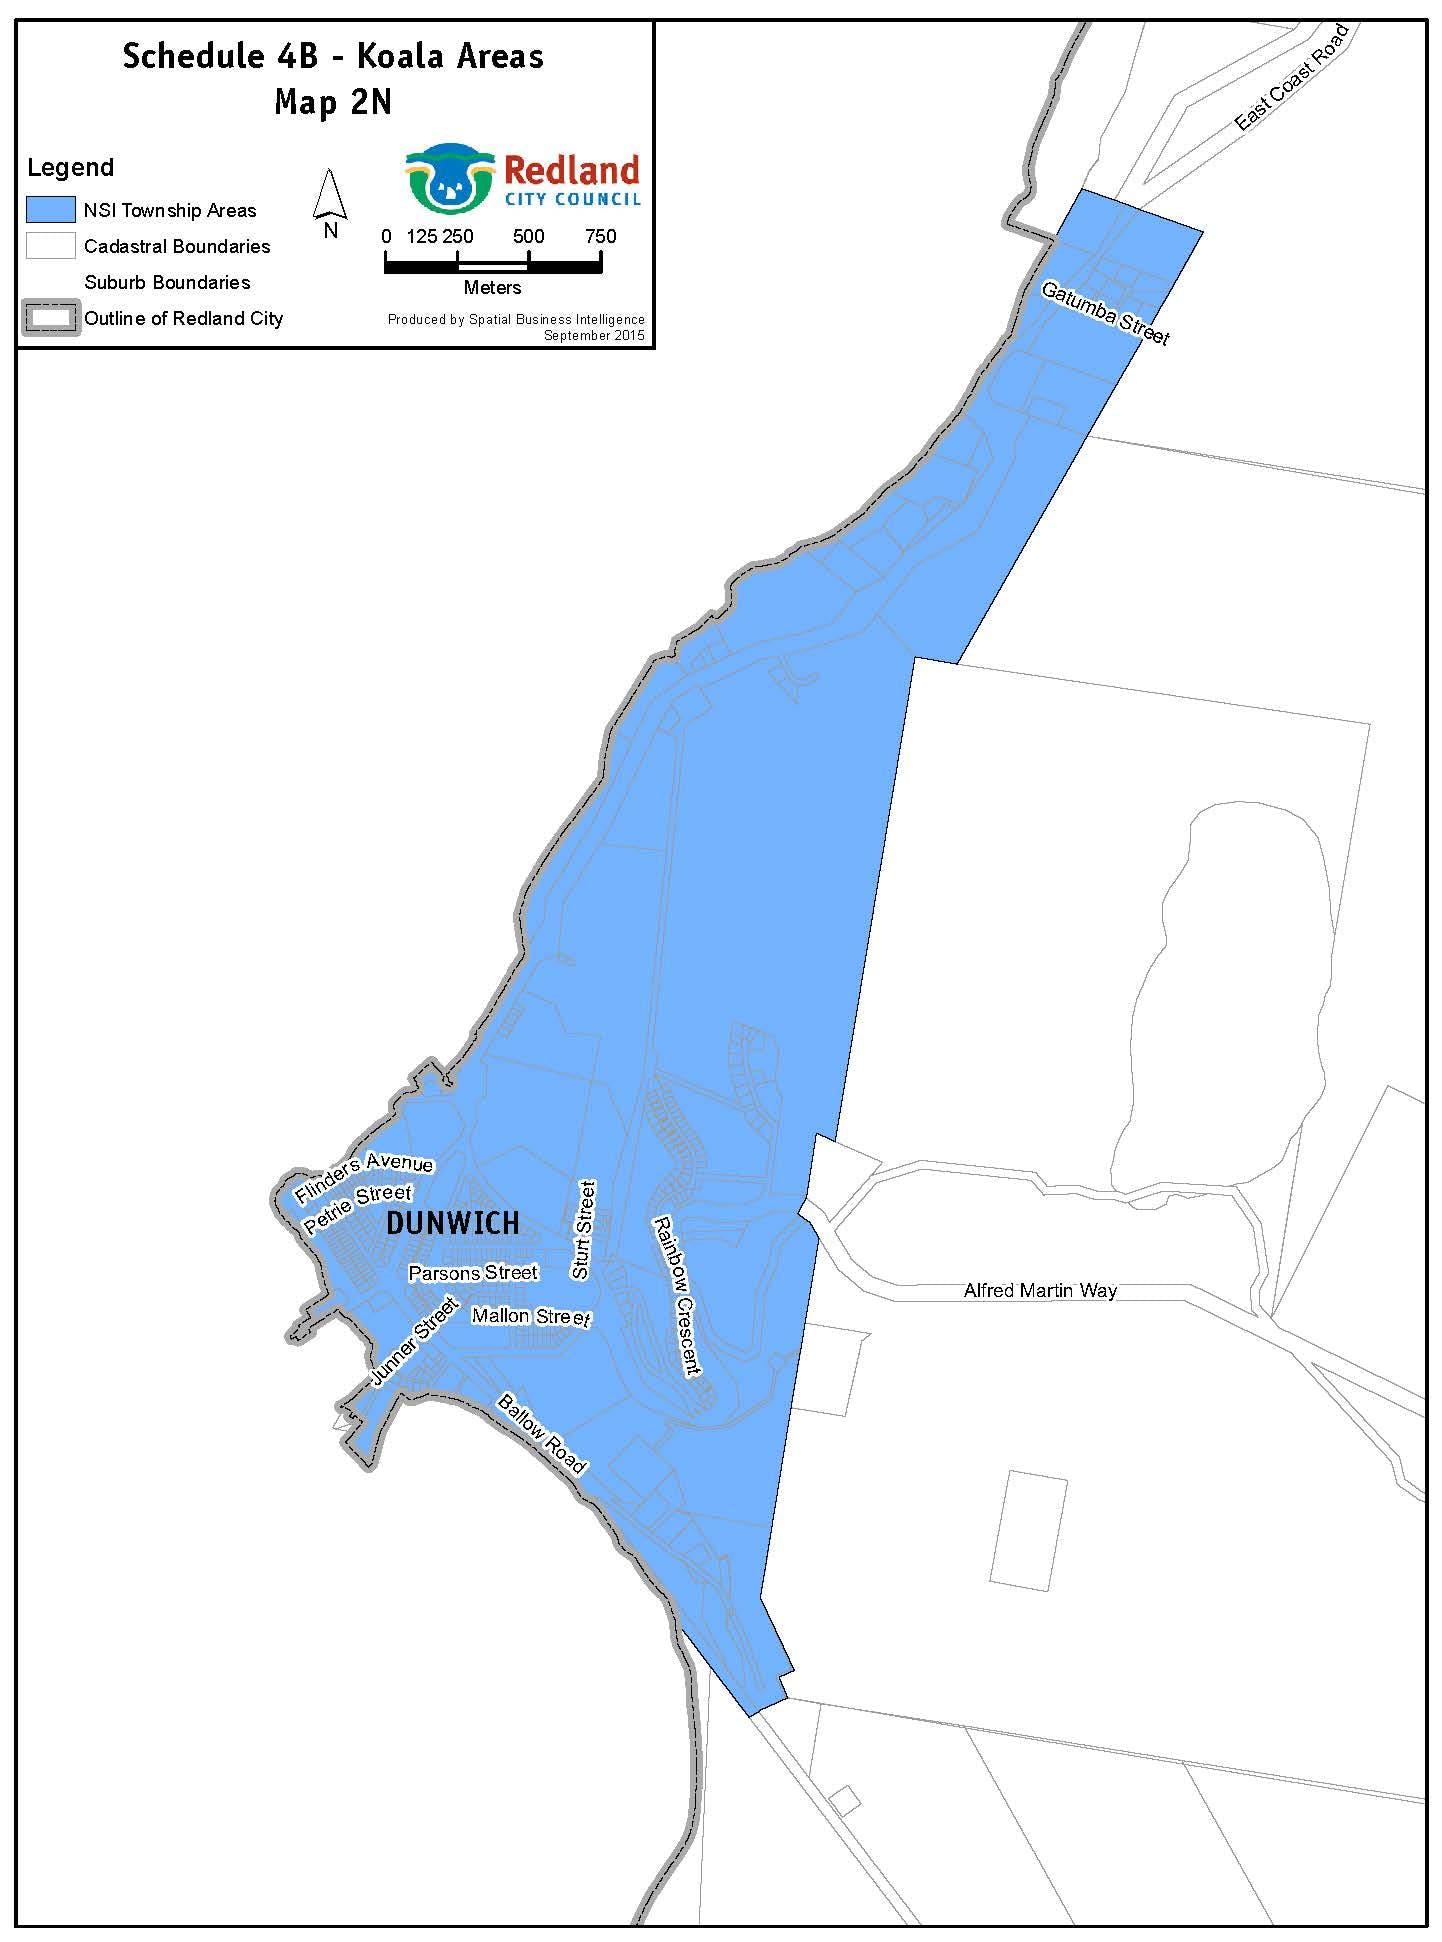 Koala Areas - Map NSI 2N